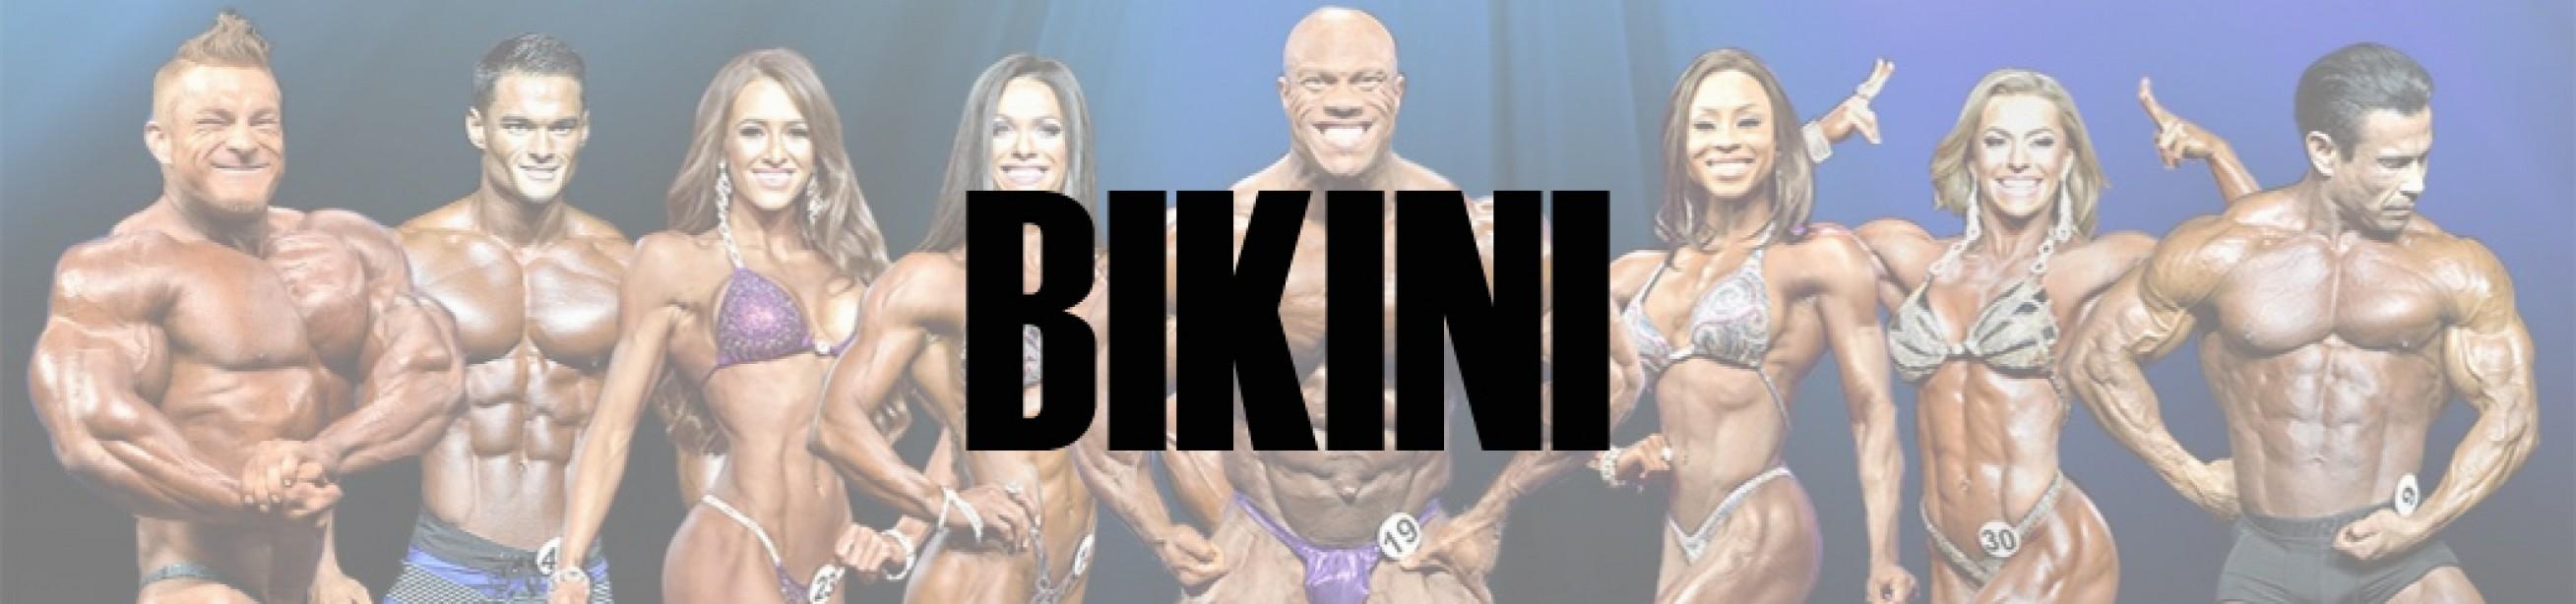 2017 Arnold Classic Bikini Call Out Report